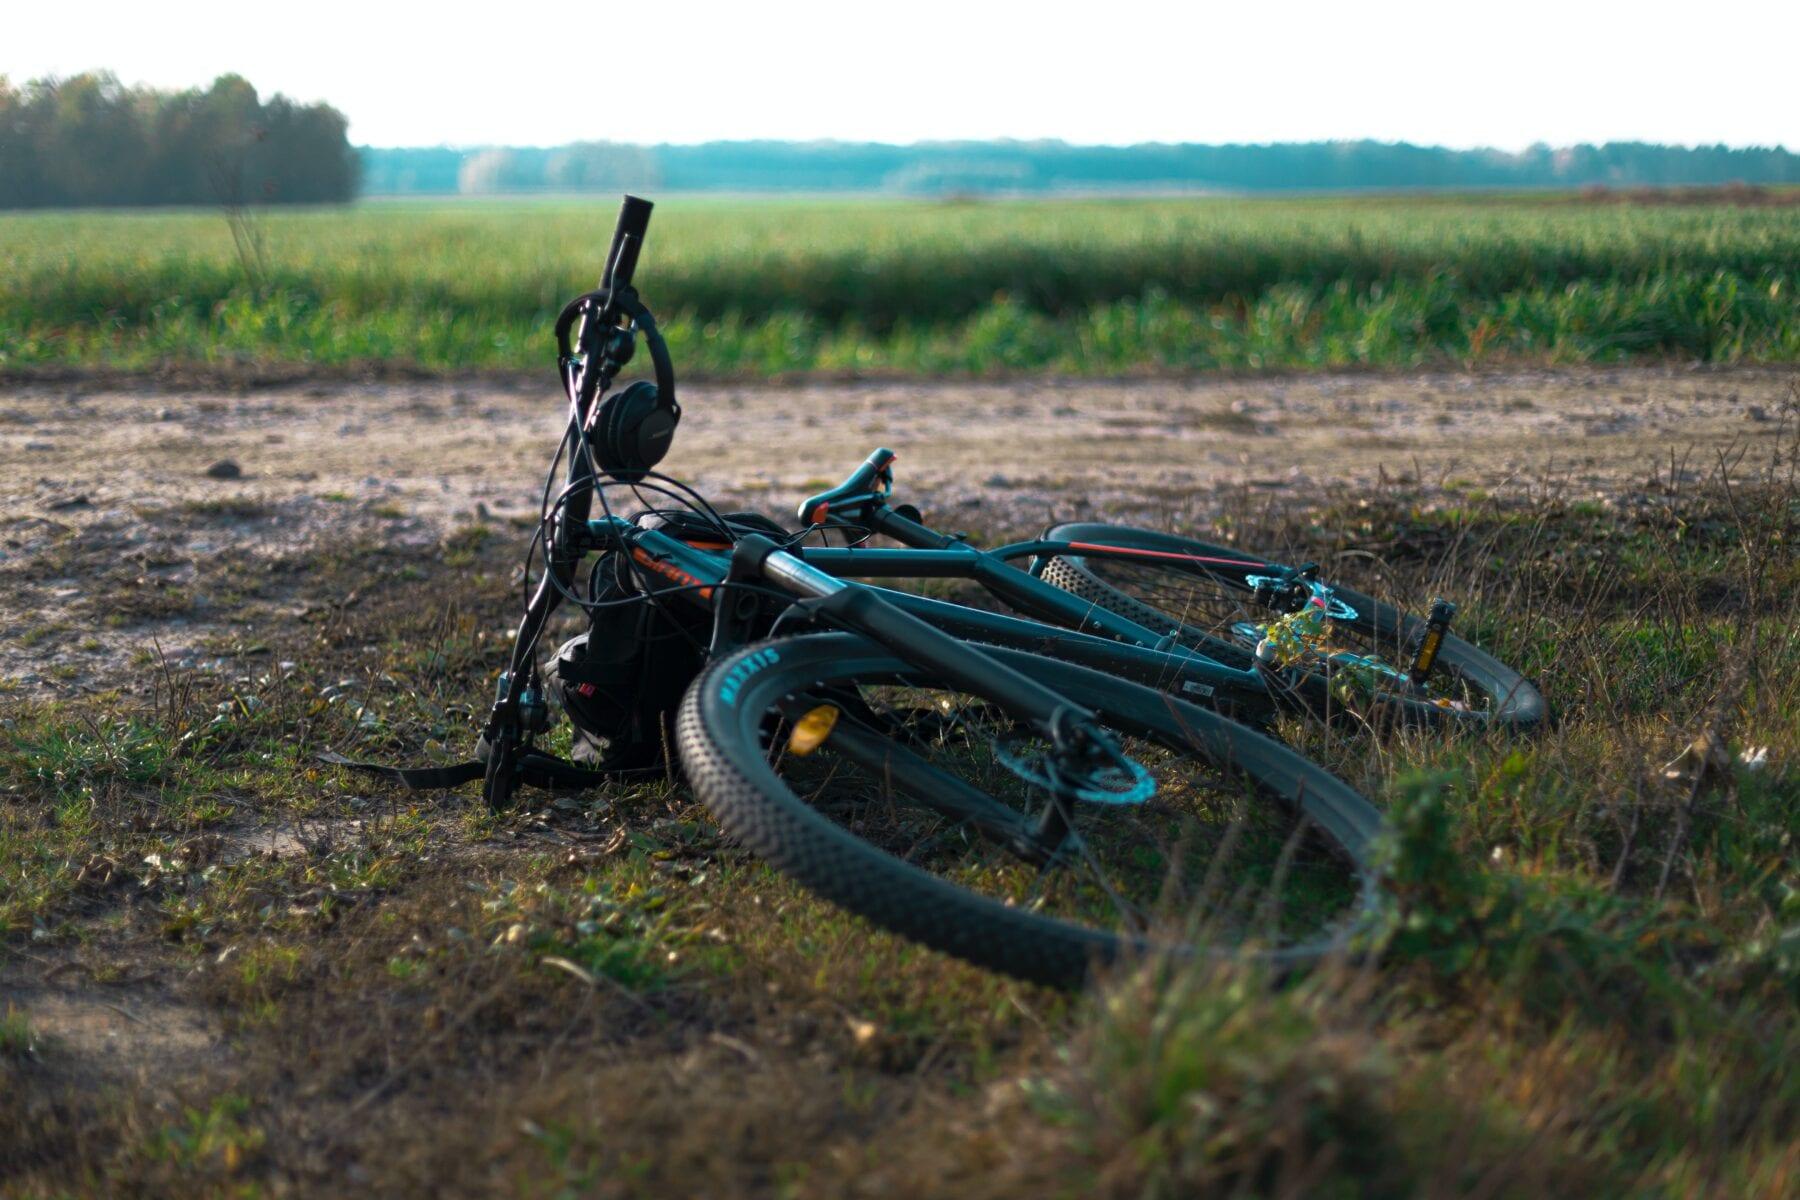 Beginnen met mountainbiken fietsframe en wielen